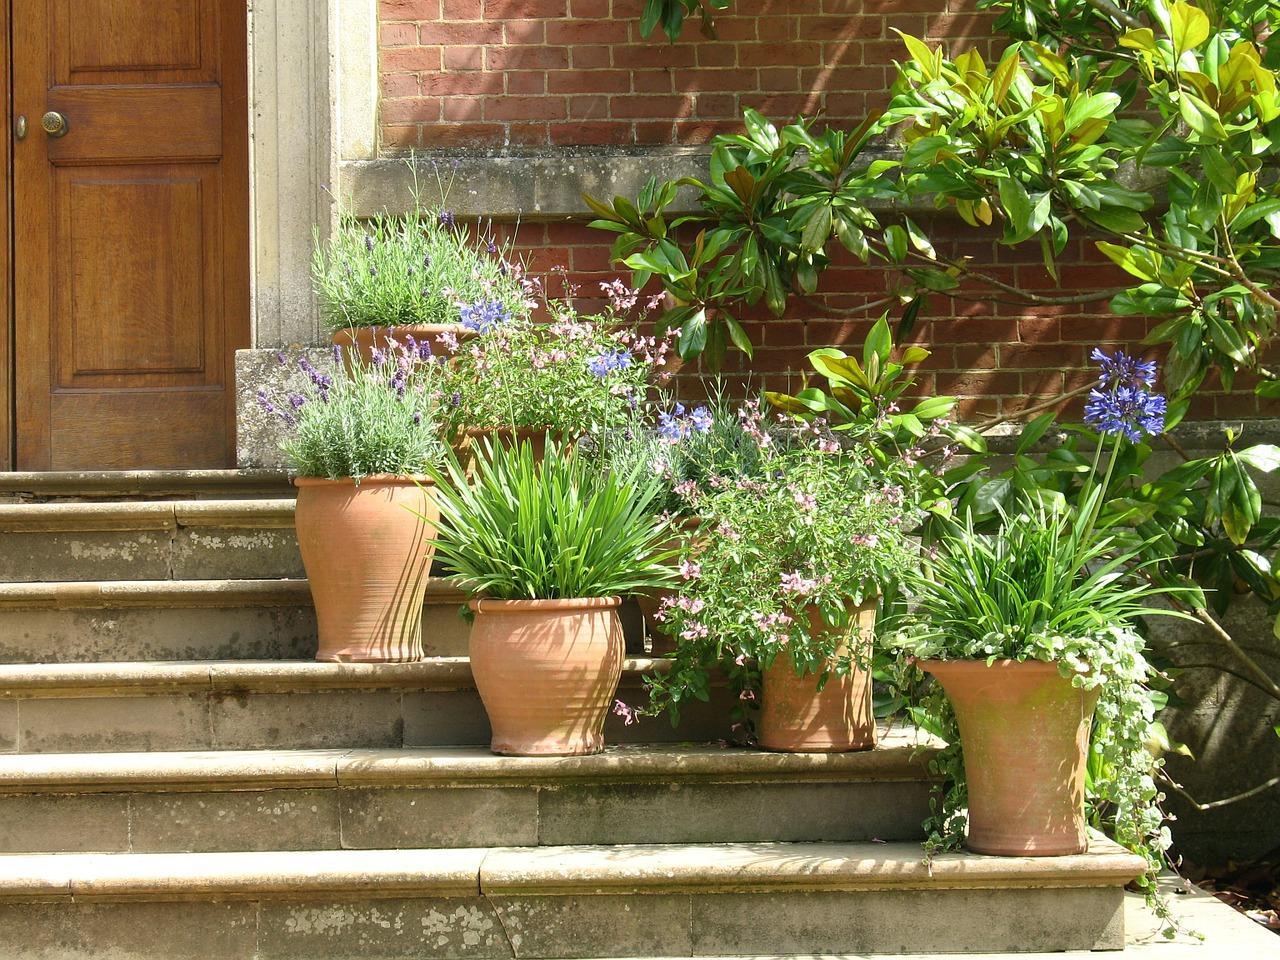 Pot plants decorations